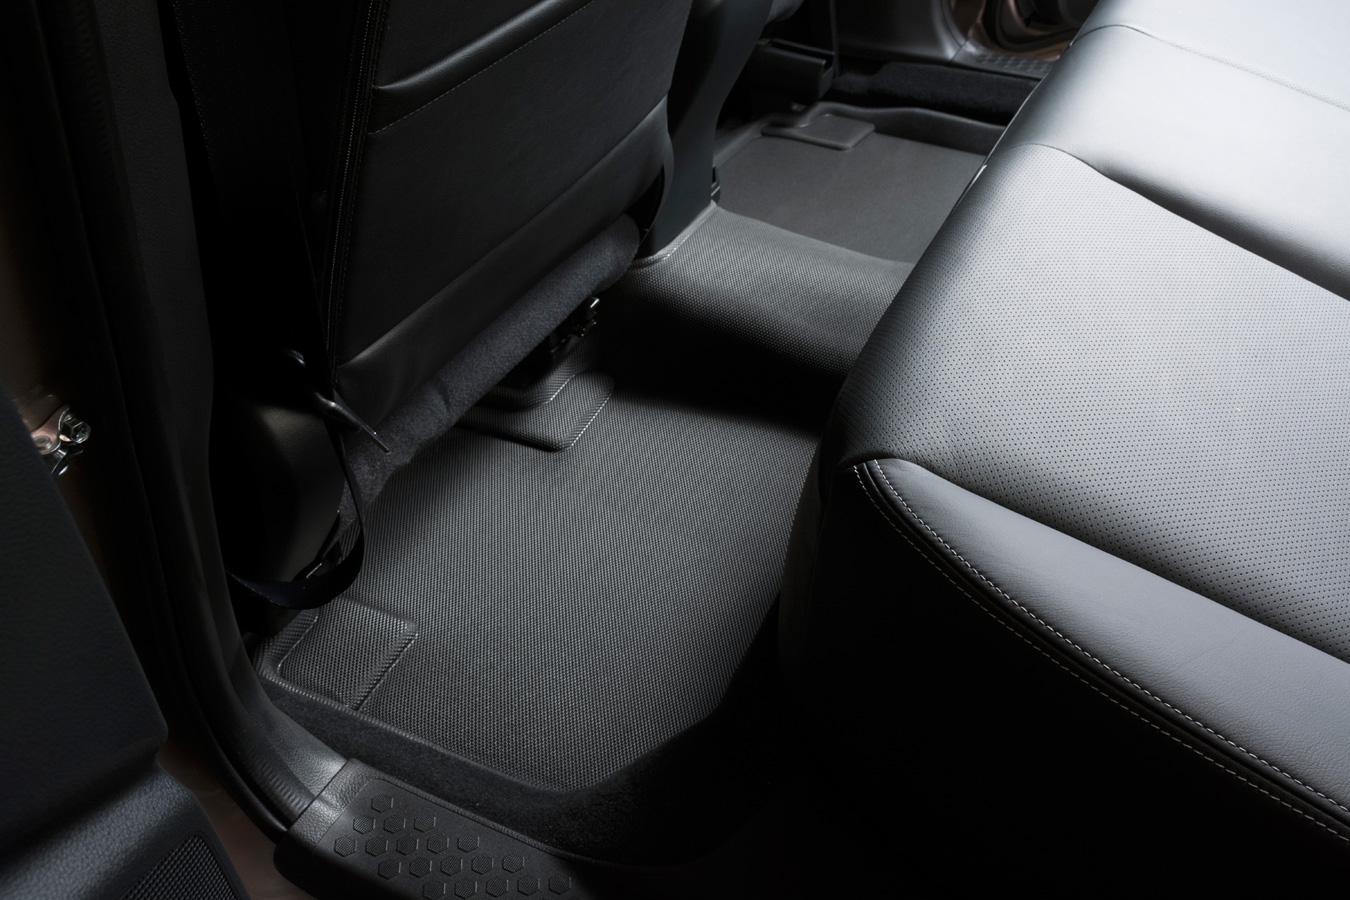 Toyota Sienna Floor Mats >> Aries StyleGuard Floor Liners - Free Shipping